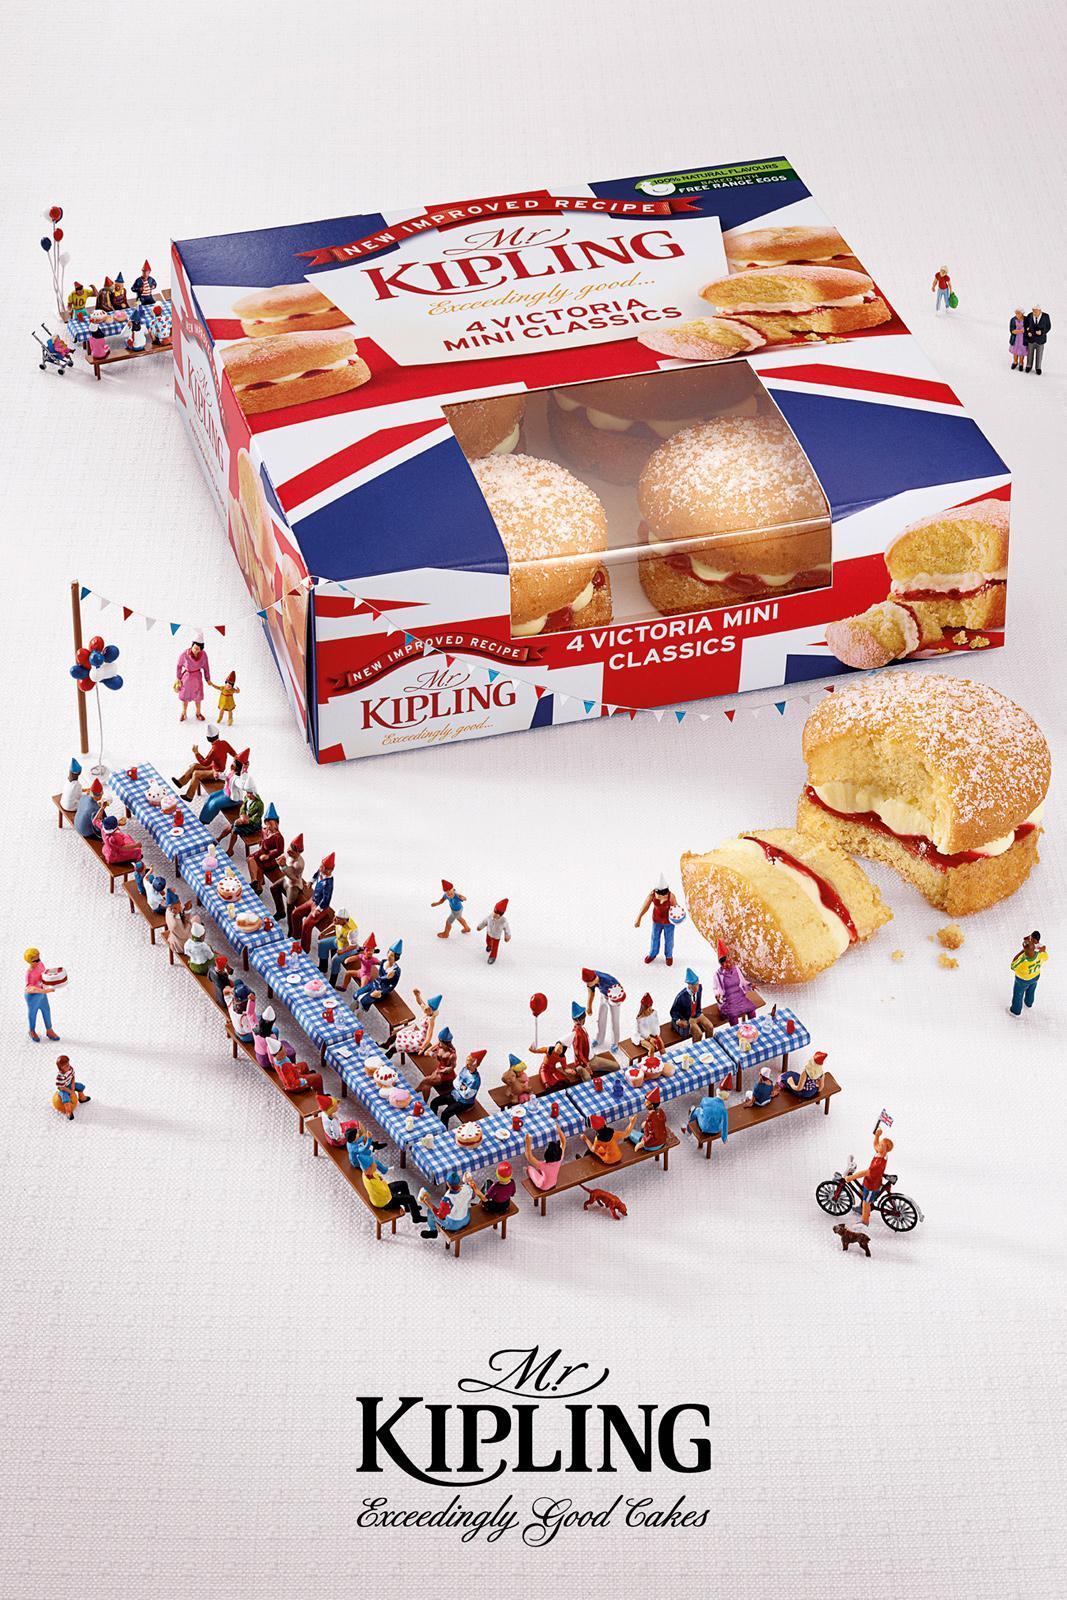 Mr Kipling Print Ad -  Jubilee Celebrations, Party